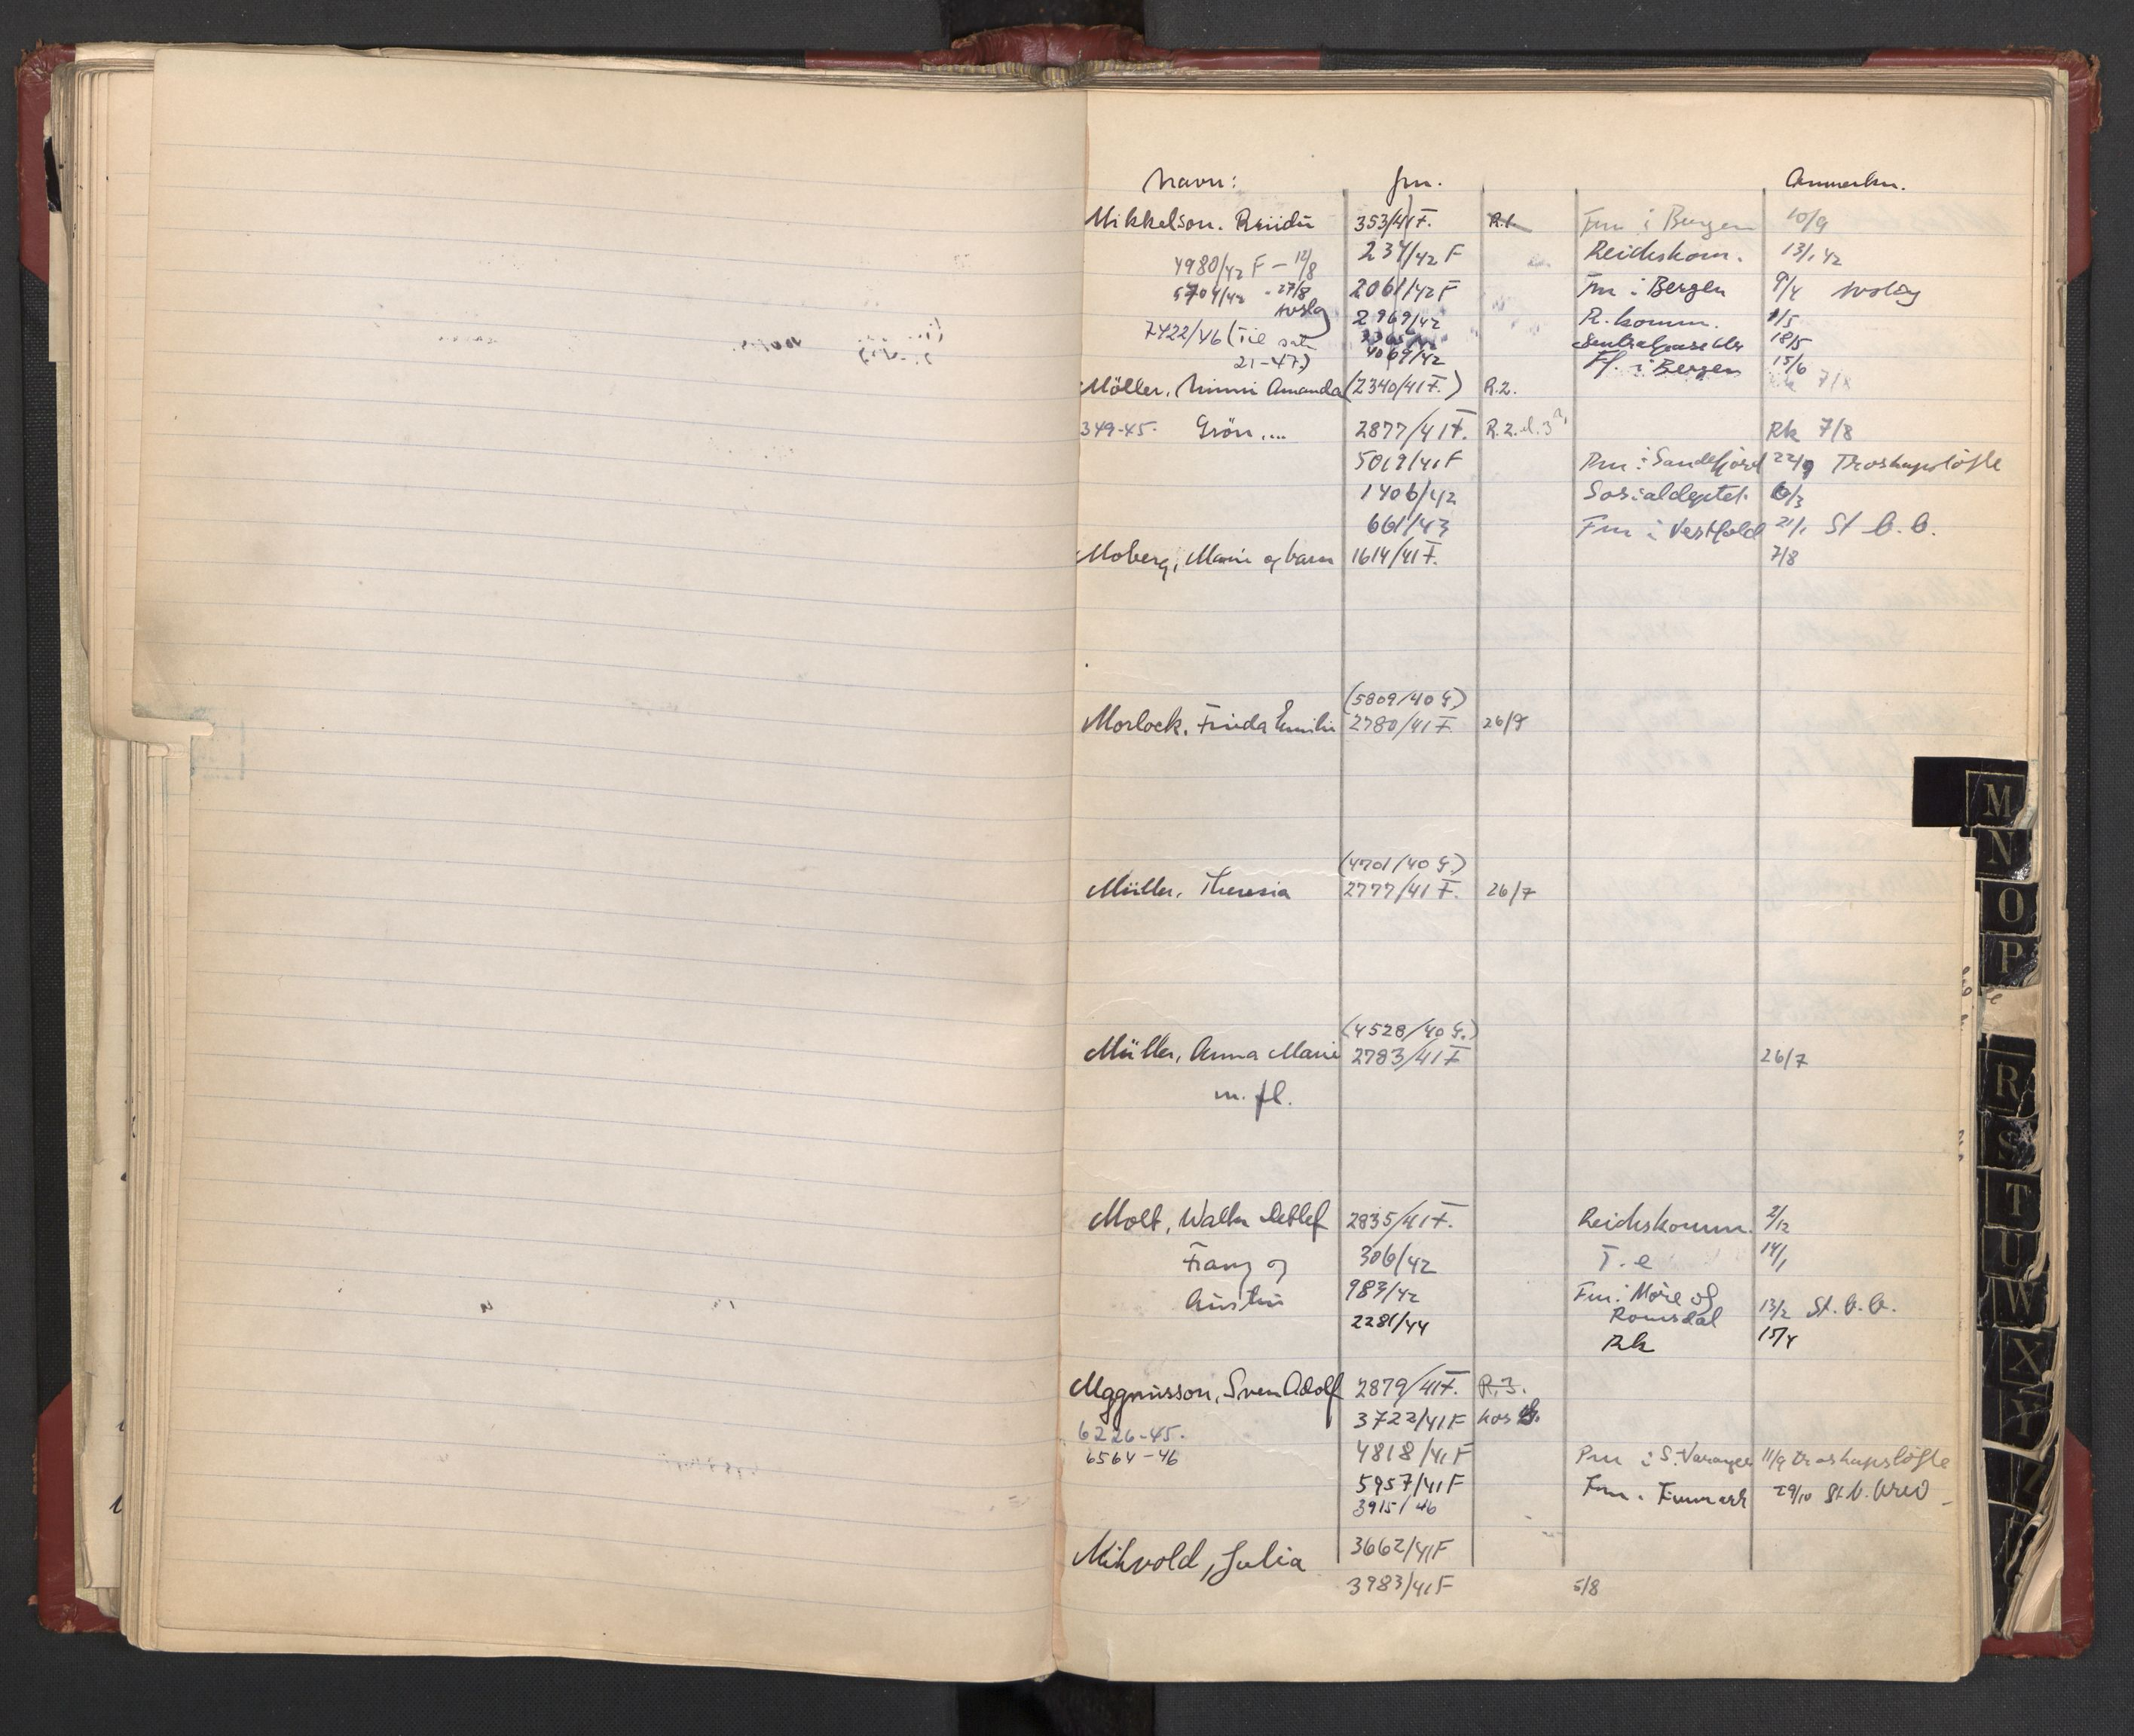 RA, Justisdepartementet, 3. politikontor P3, C/Cc/L0002: Journalregister over statsborgersaker, 1940-1946, s. 66